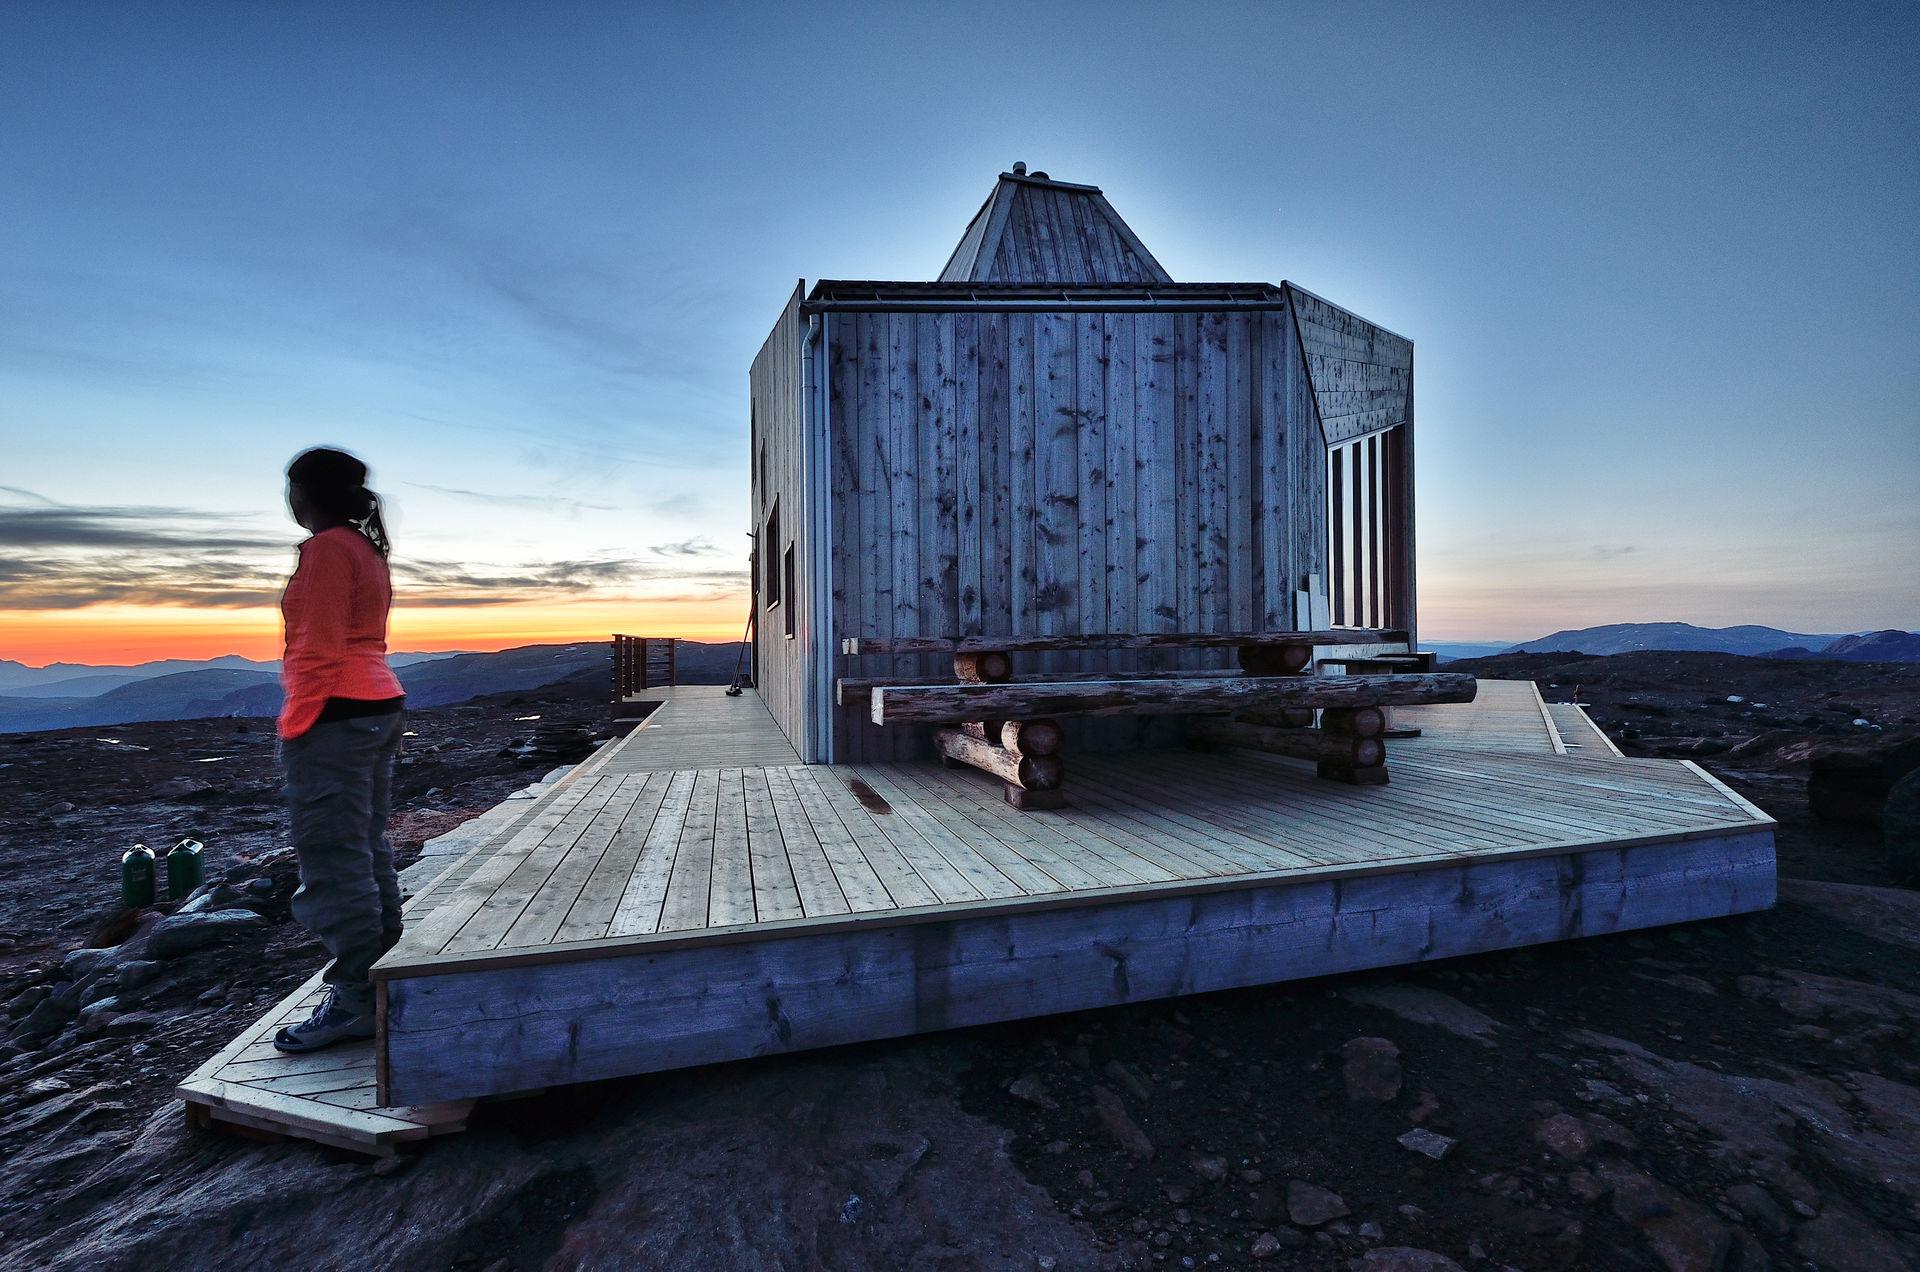 Sunset above the Rabot Cabin © Fabrice Milichau